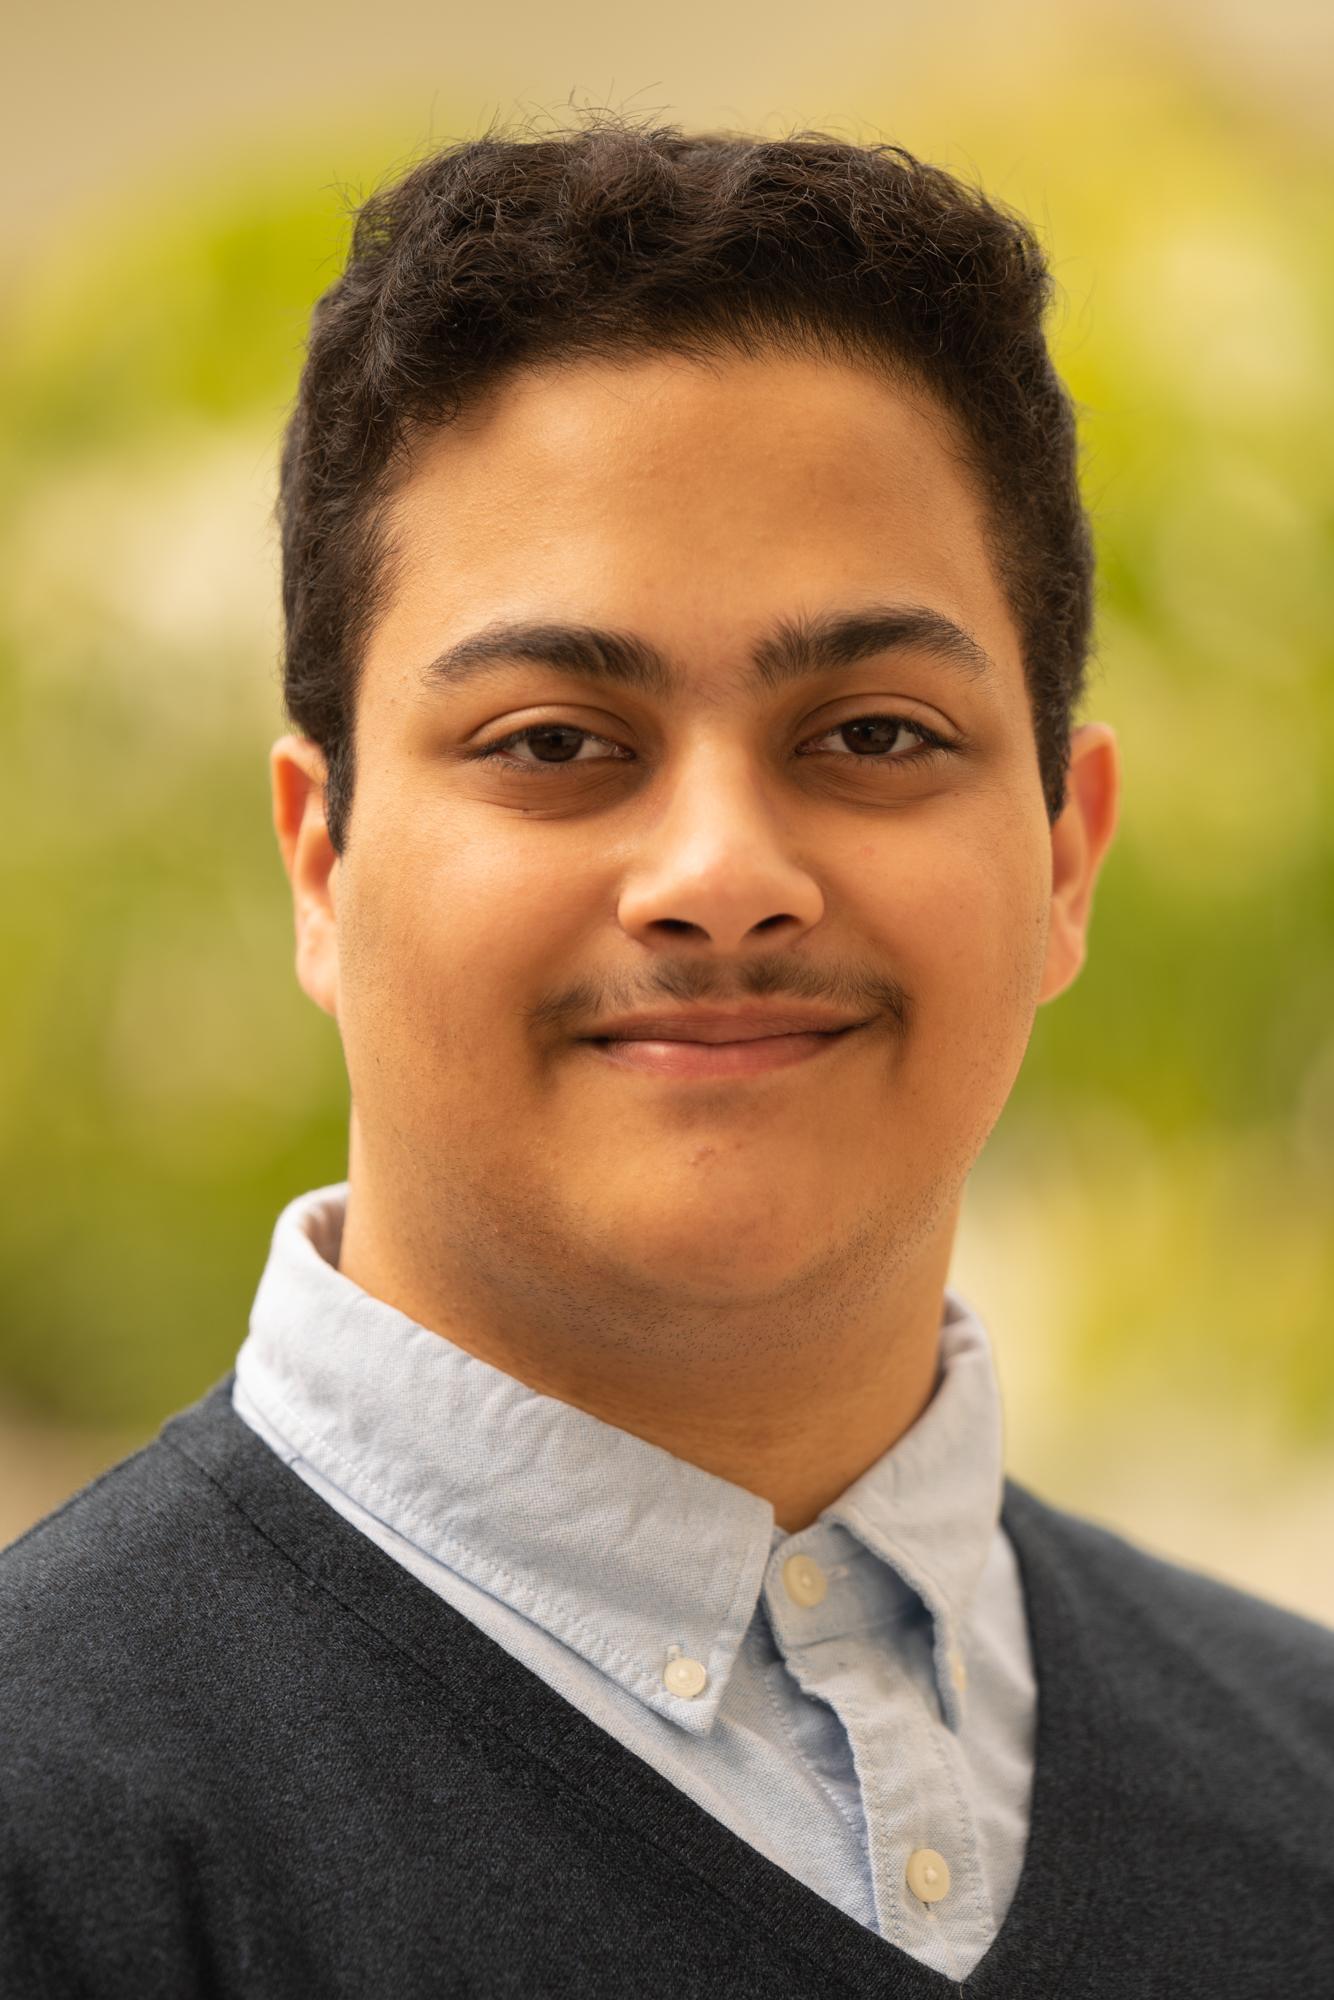 Student Spotlight: Bakur Madini